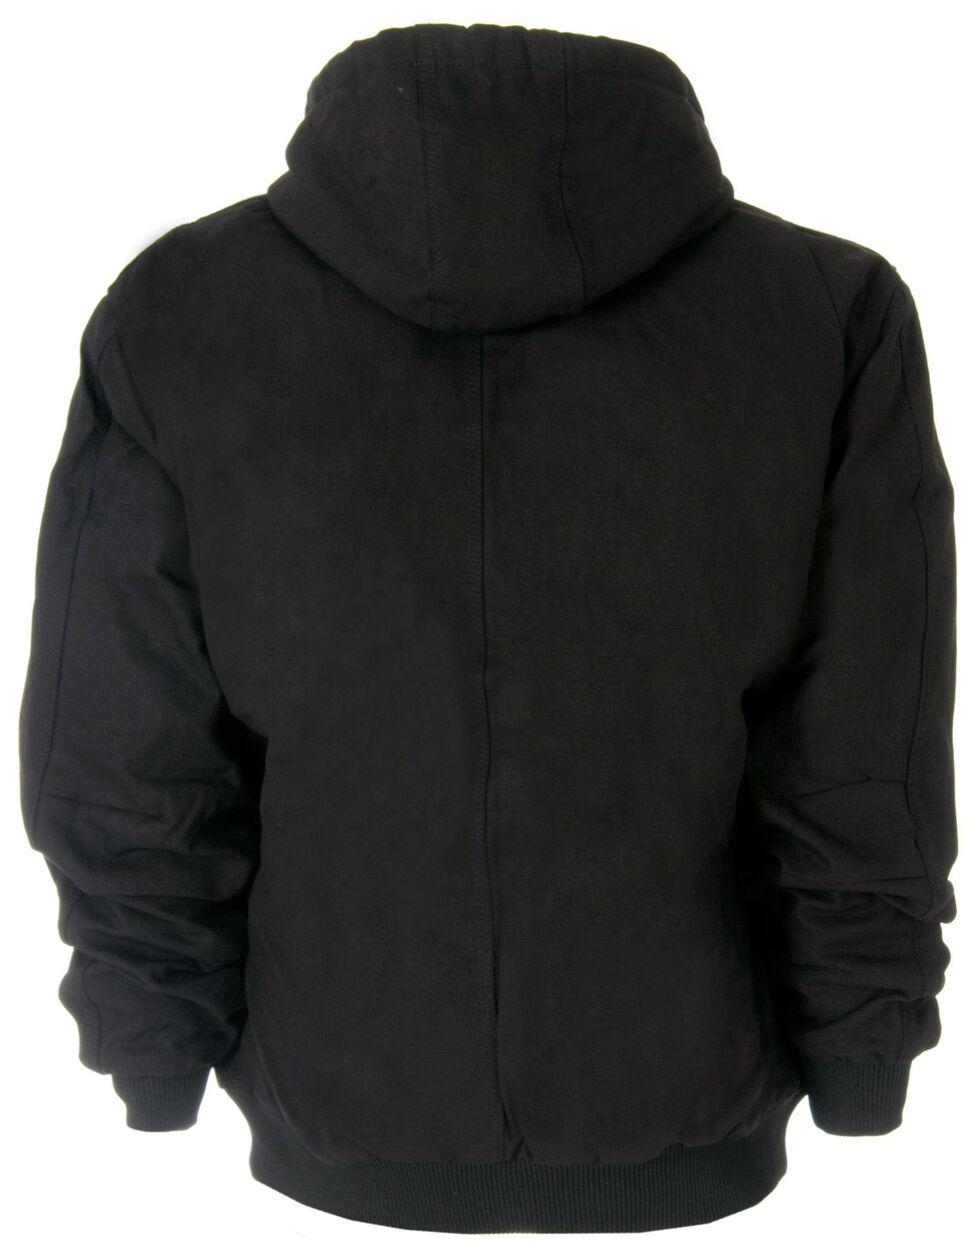 Berne Duck Original Hooded Jacket - 3XL and 4XL, Black, hi-res